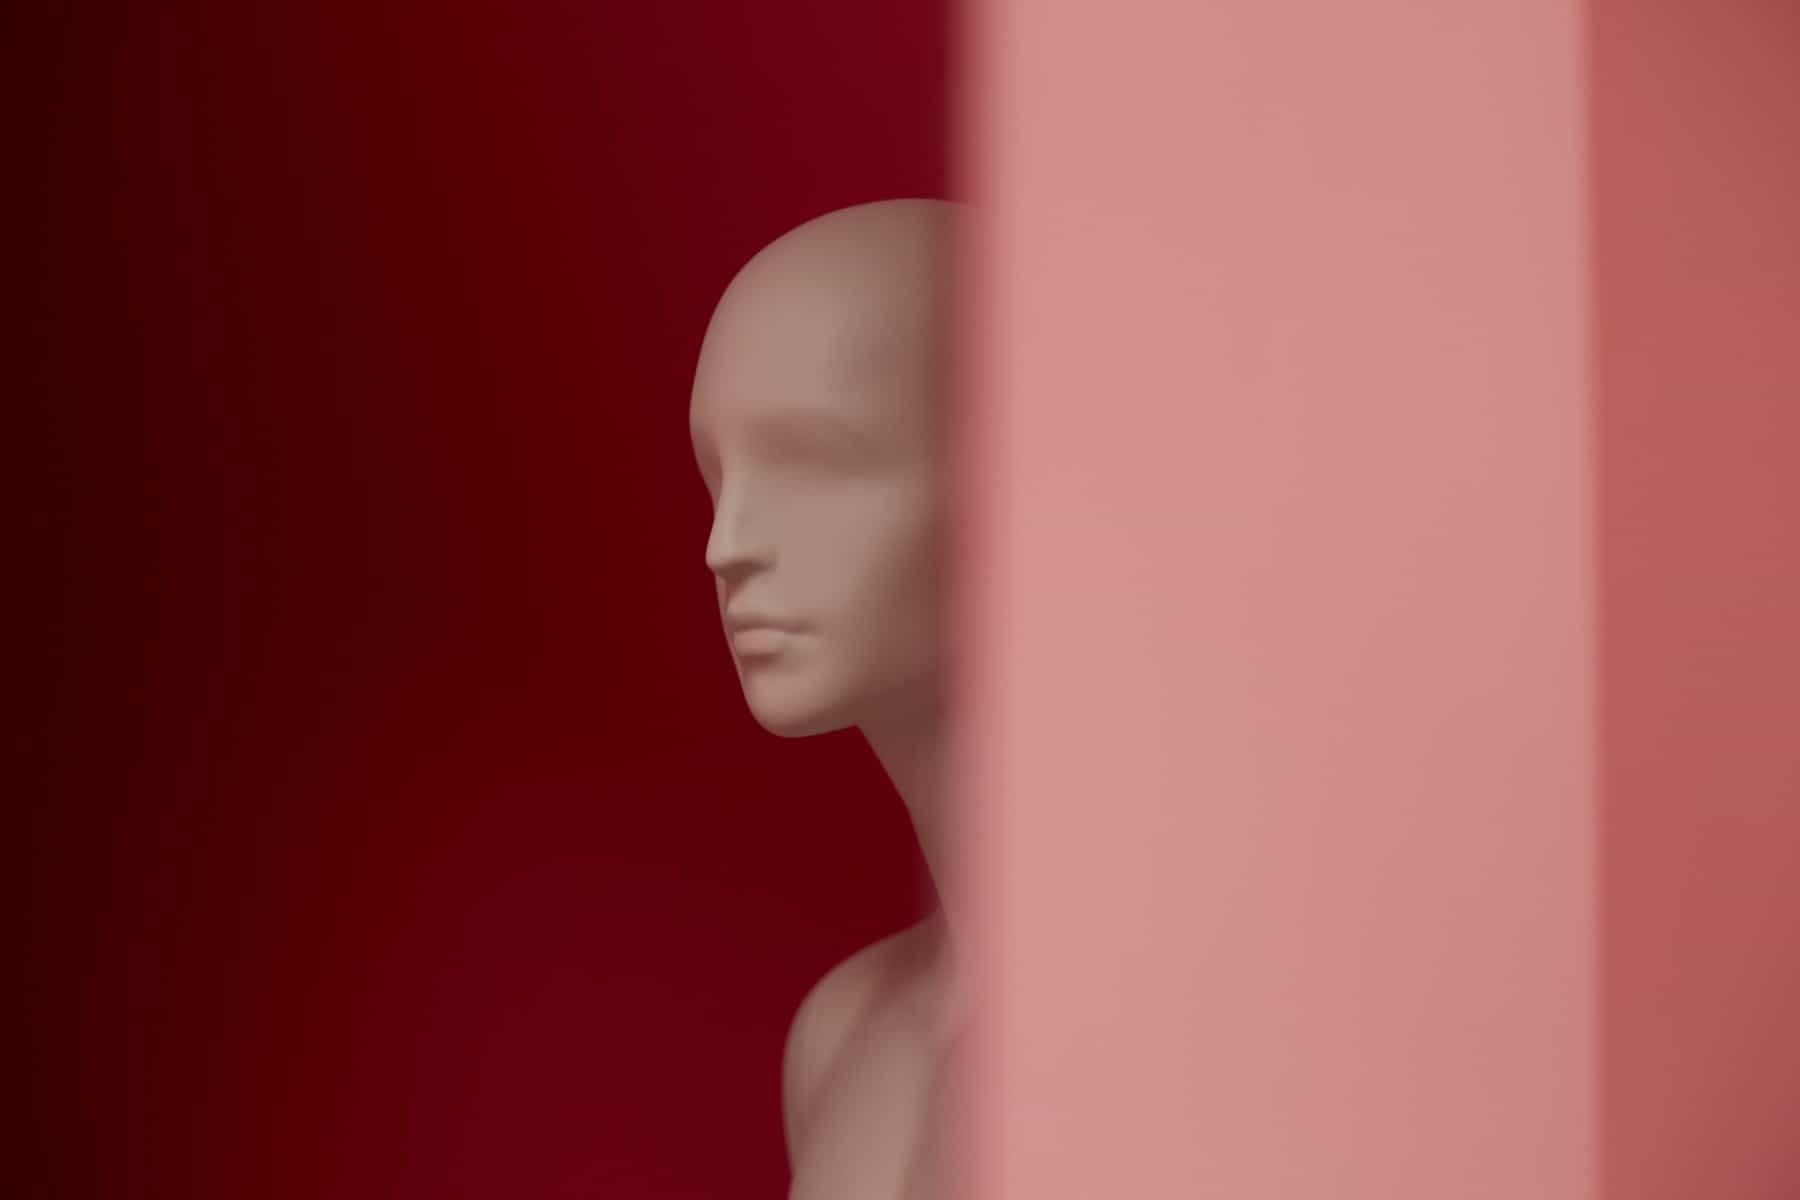 blue-studio-italian-mannequins-fashion-accessory-displays-7-1800x1200_c